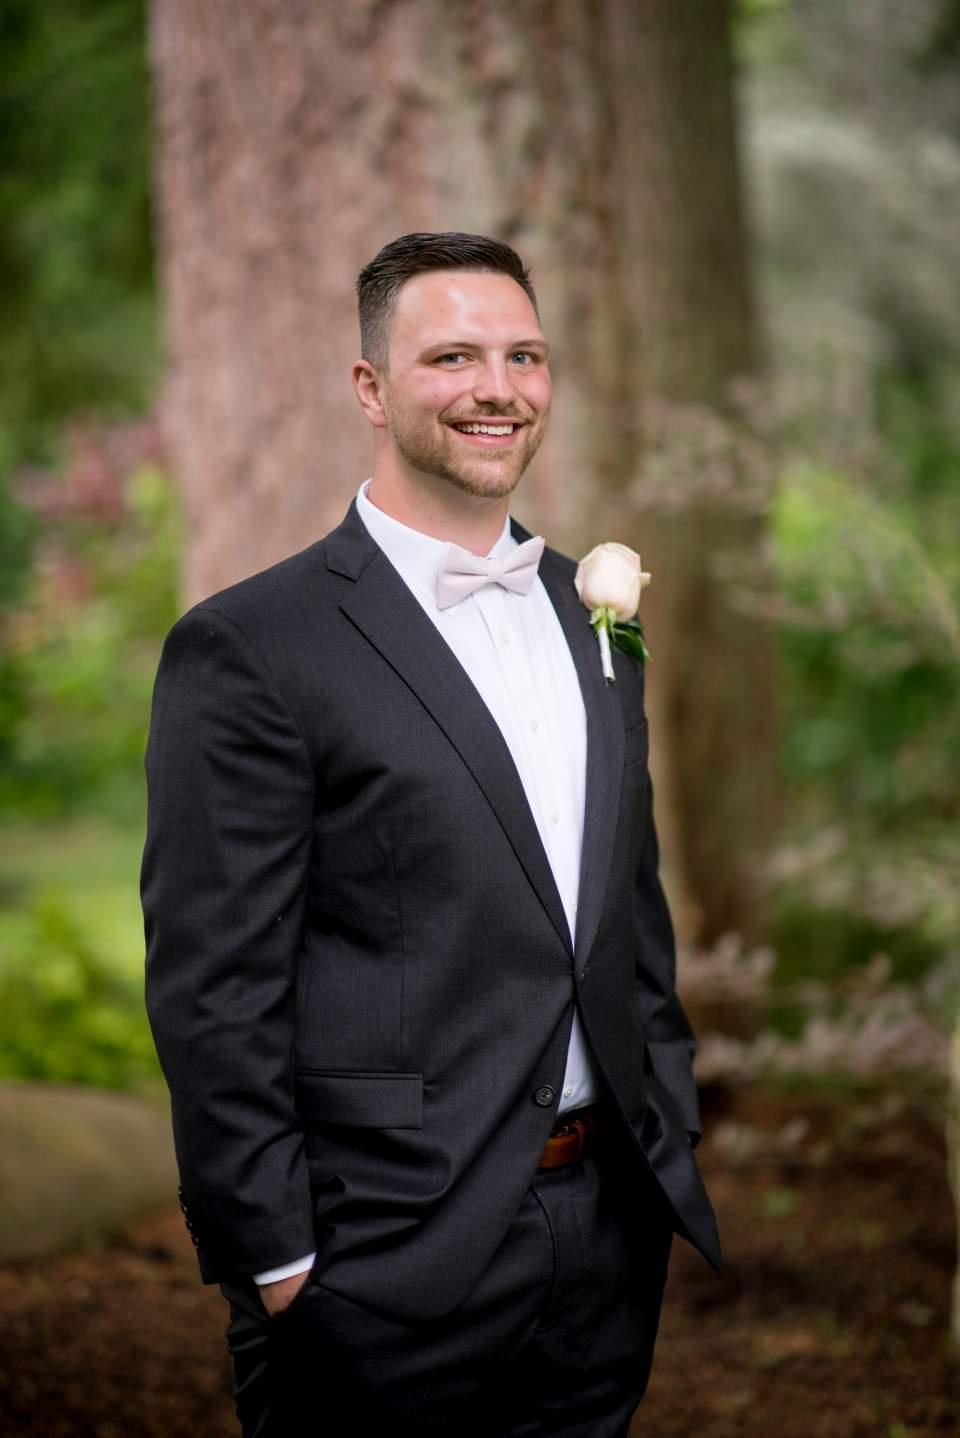 classic style groom portrait